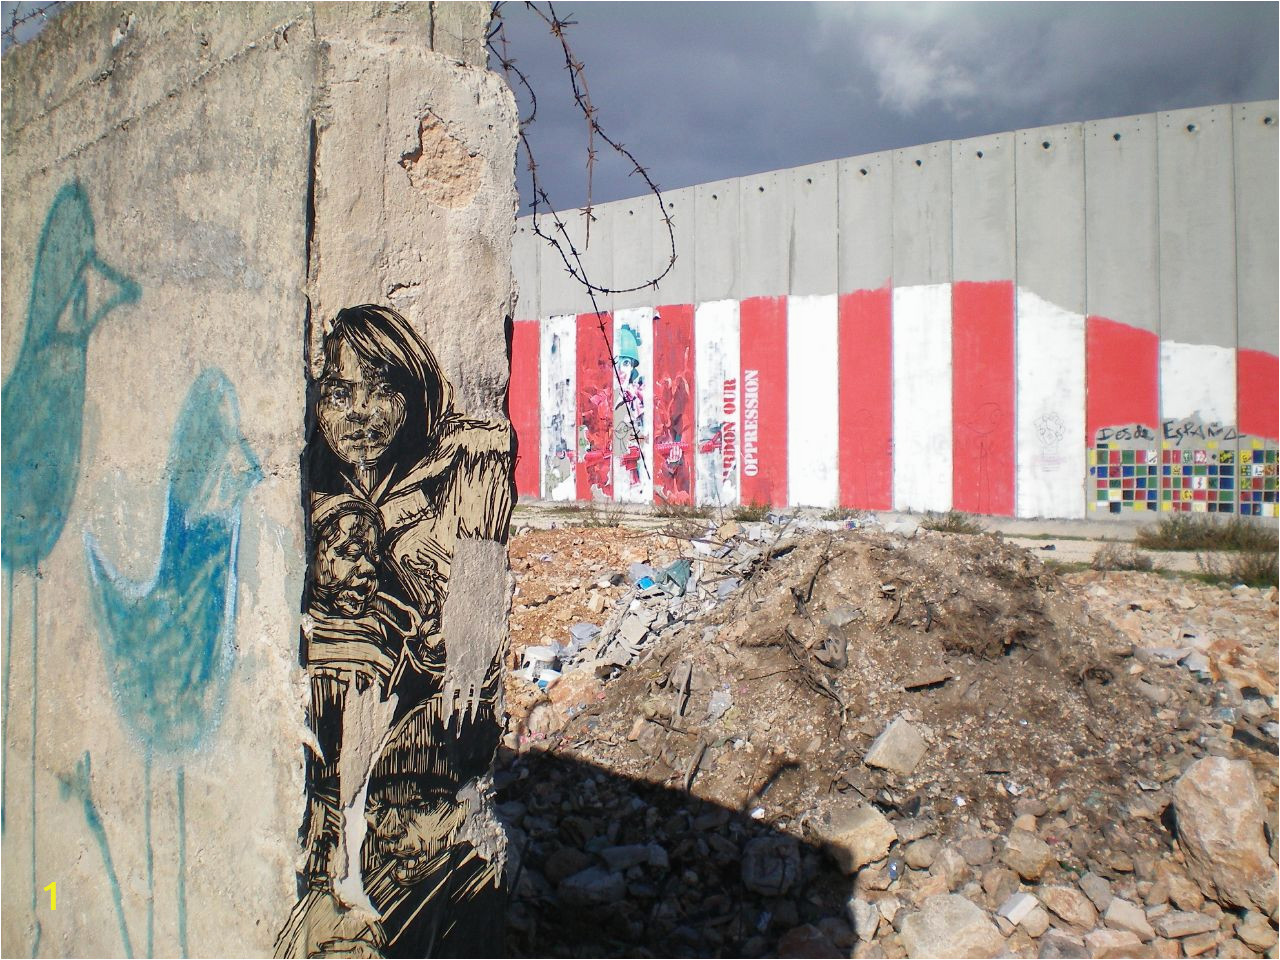 Bethlehem wall graffiti by Swoon and Ron English